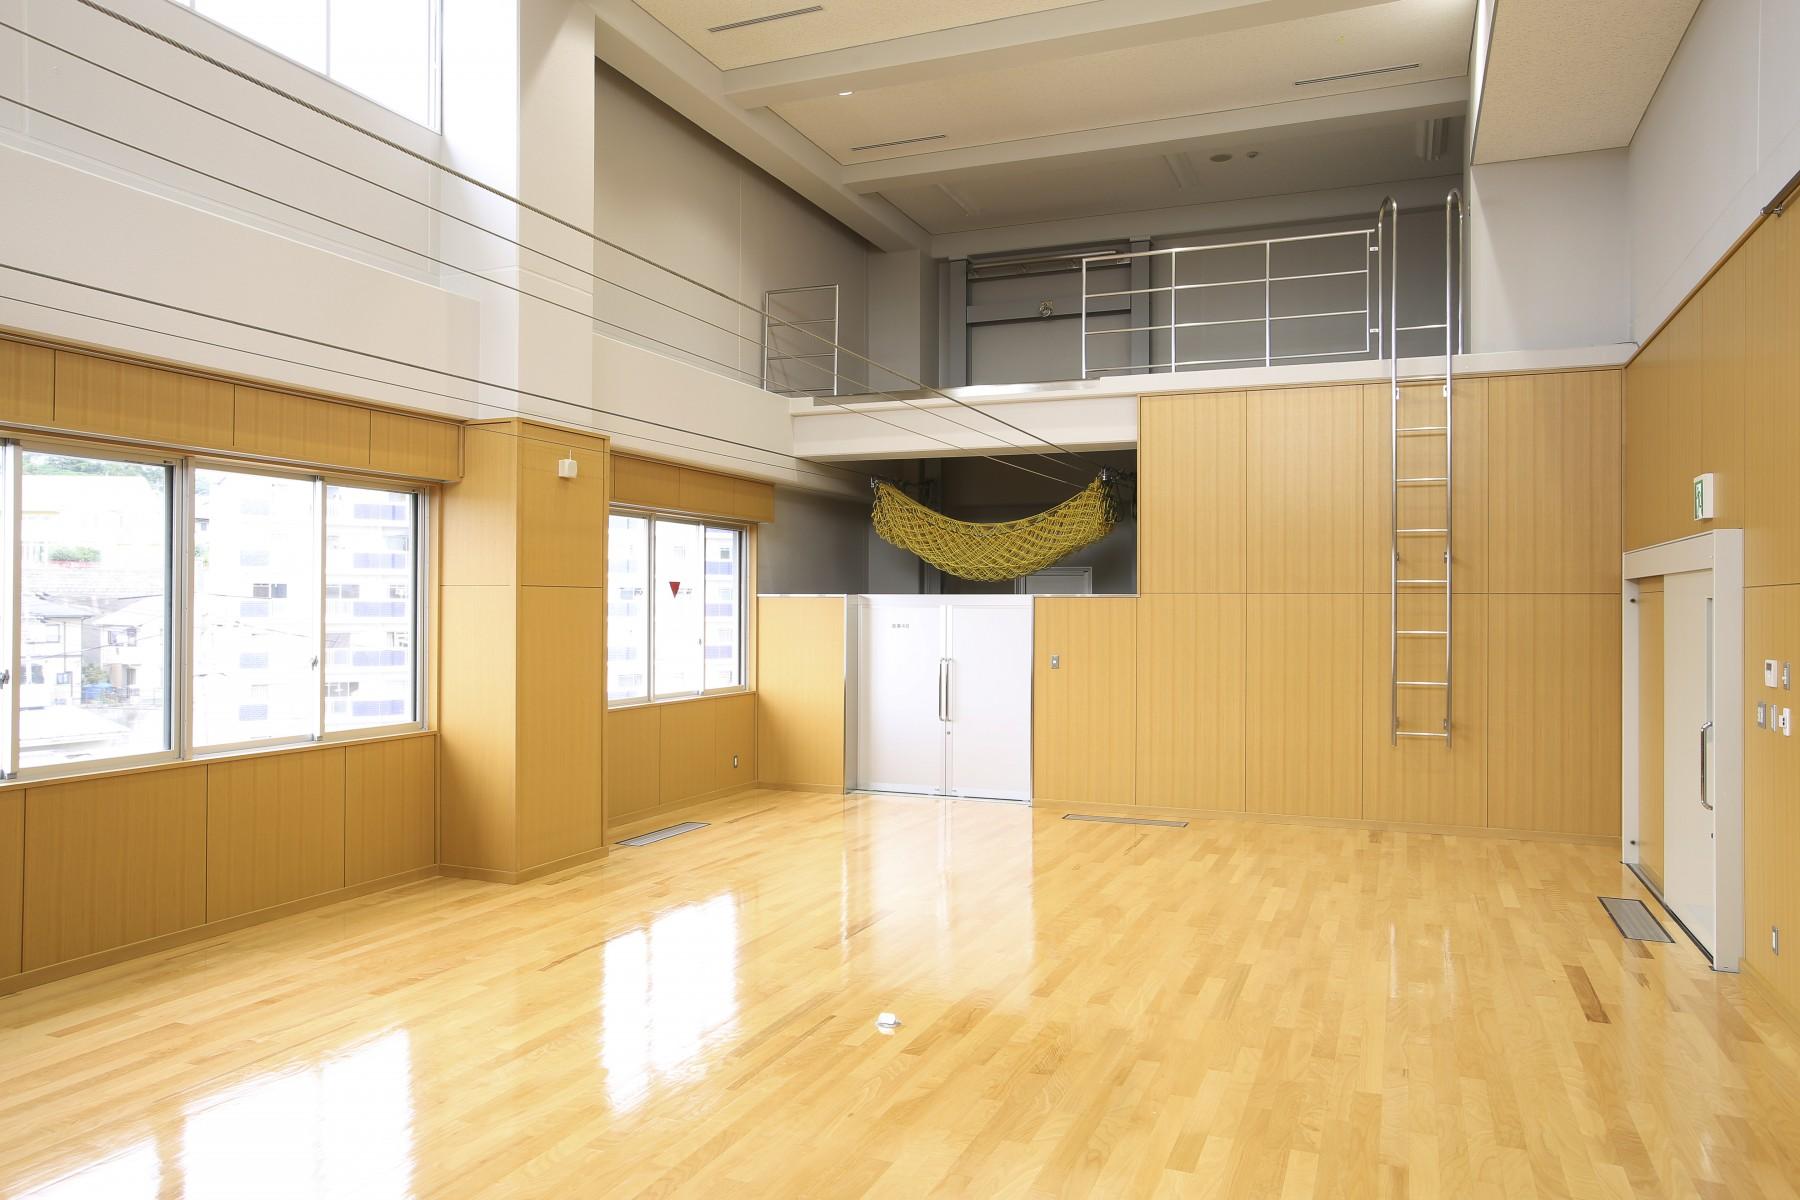 No.36.4階講堂兼室内訓練場1